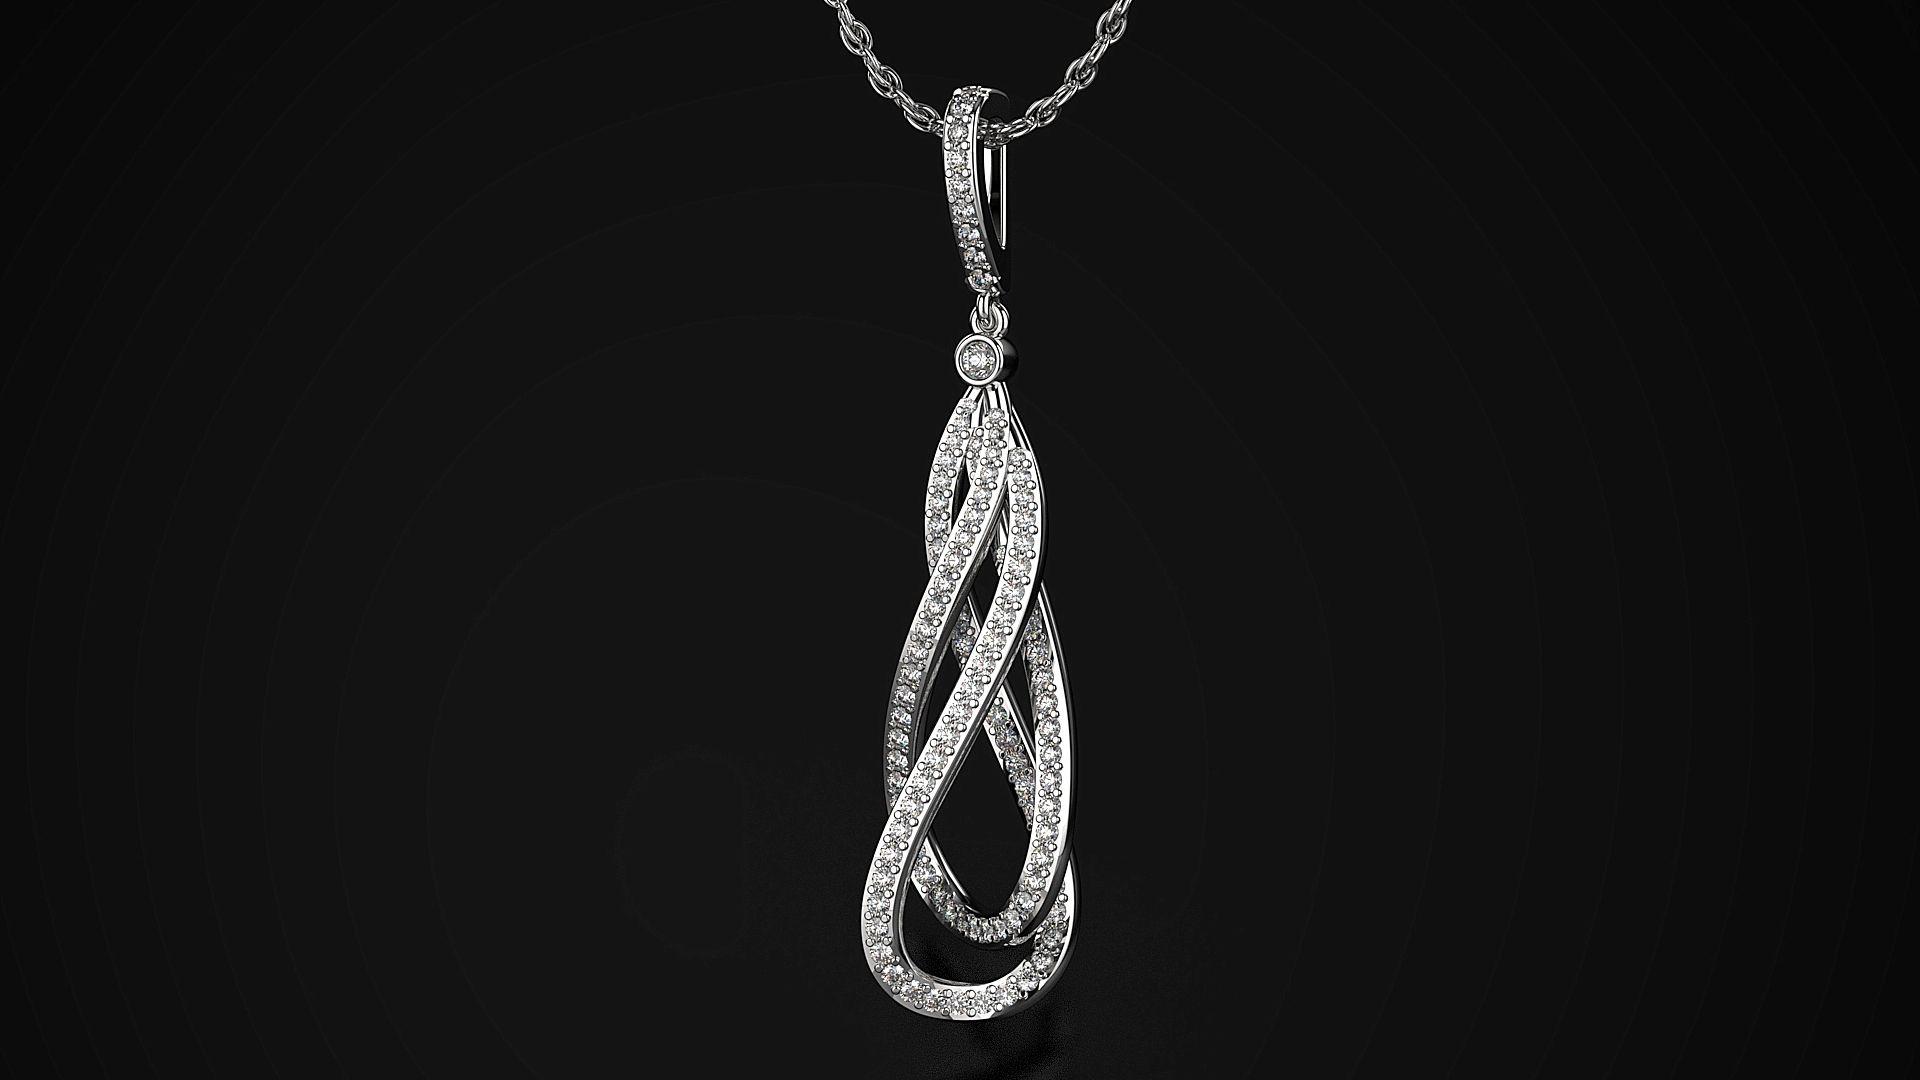 Prestige Intertwined Diamond Pendant